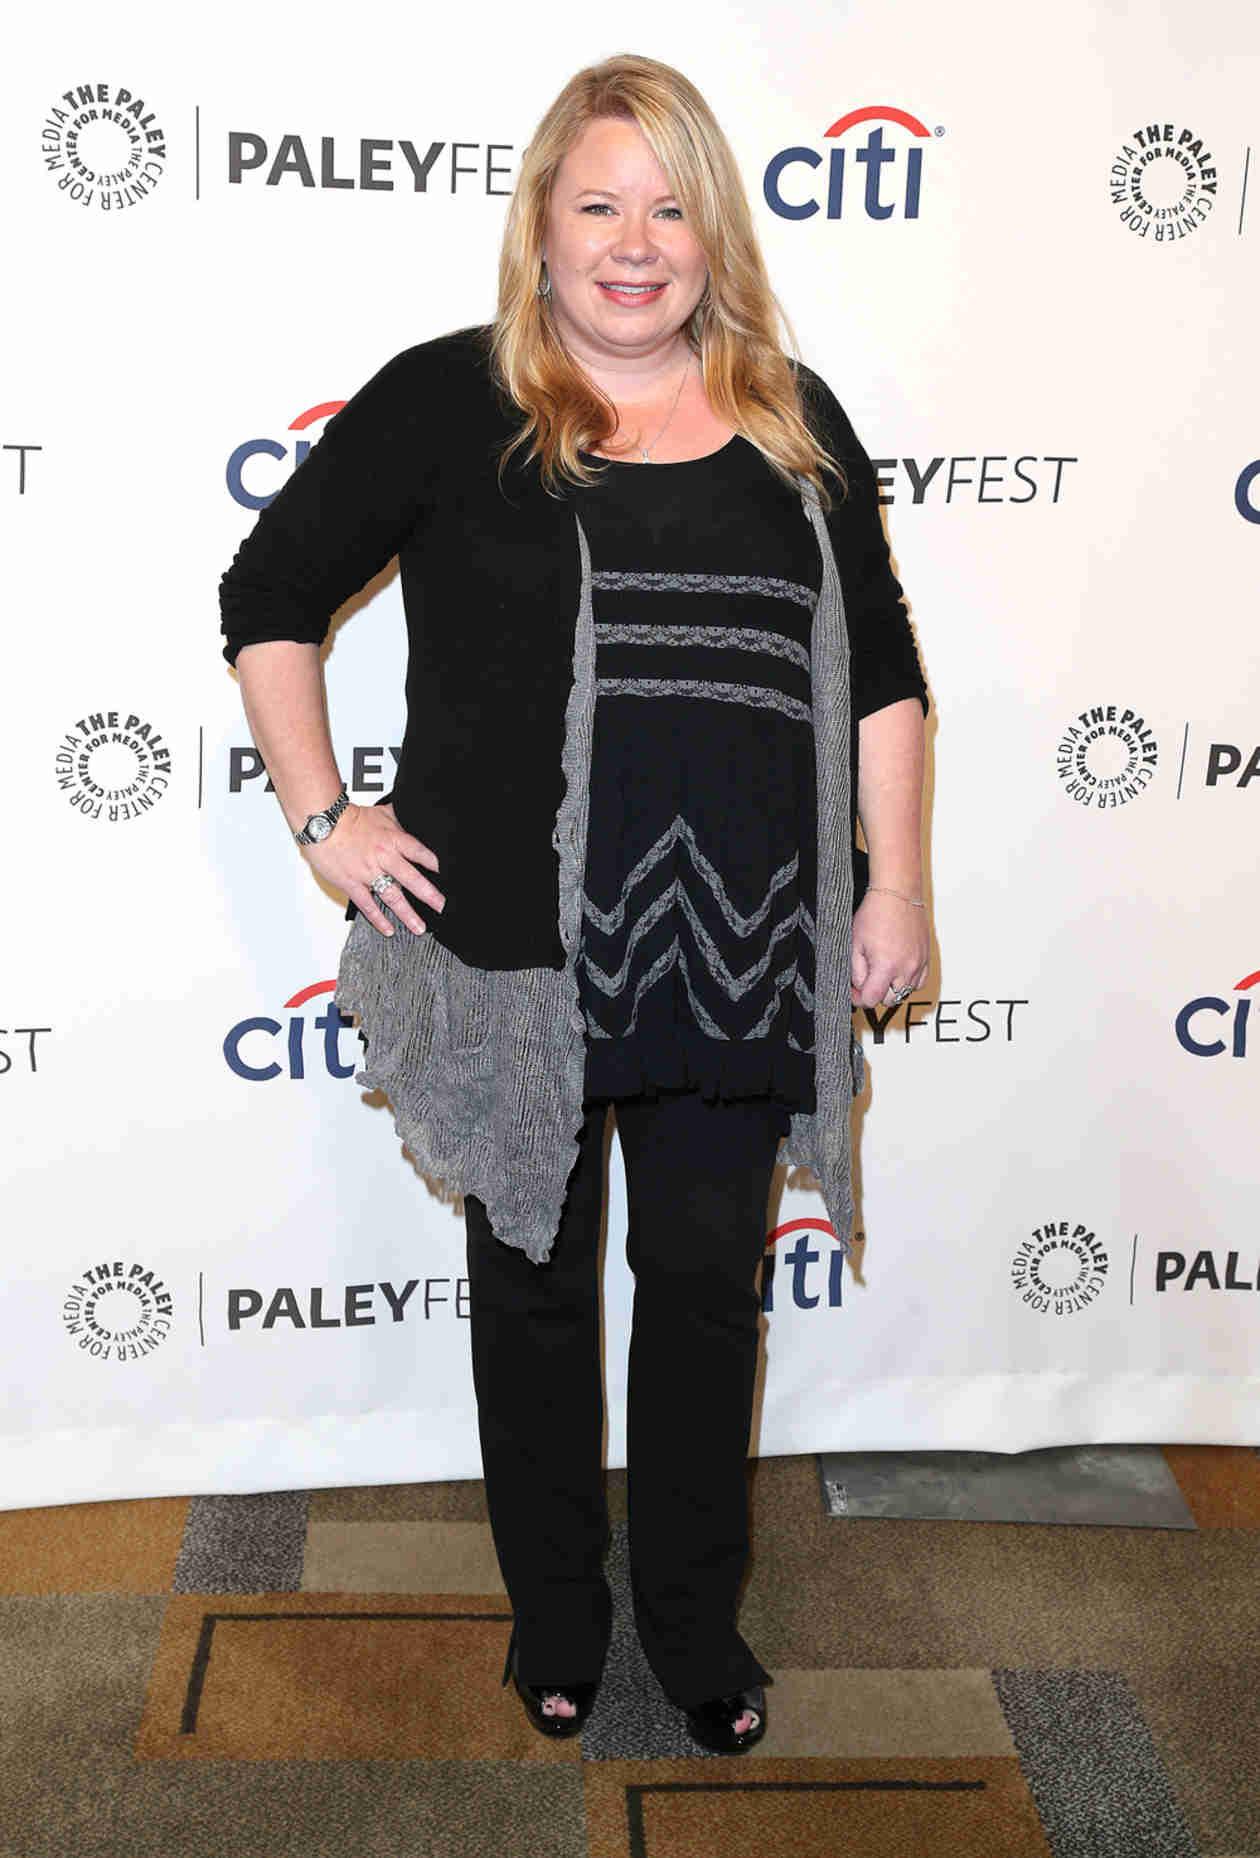 Julie Plec Making Directorial Debut in Vampire Diaries Season 6